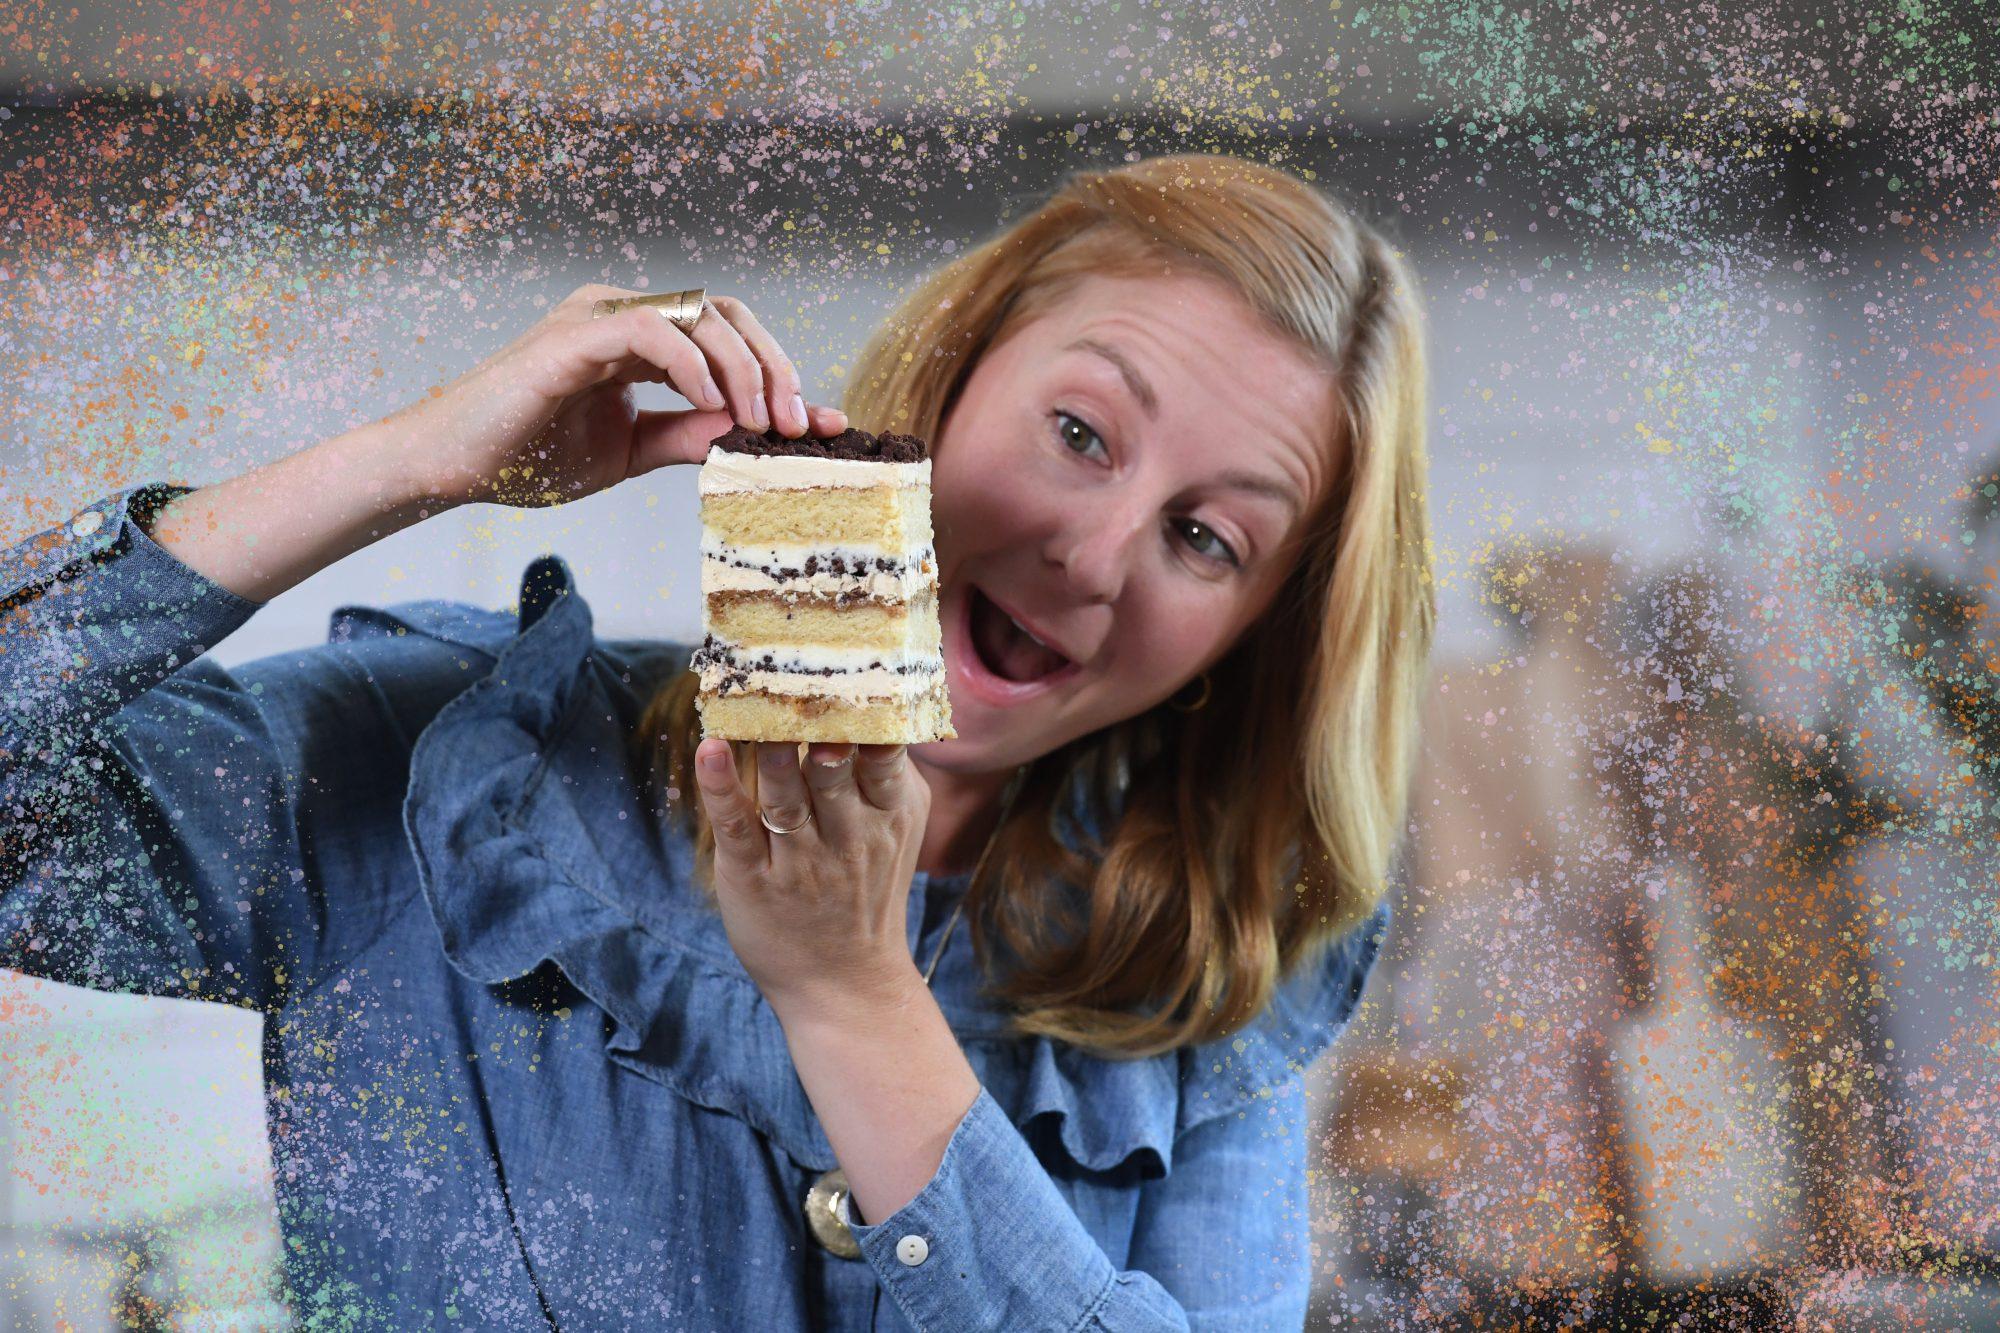 christina-tosi-cake-coffee-1.jpg